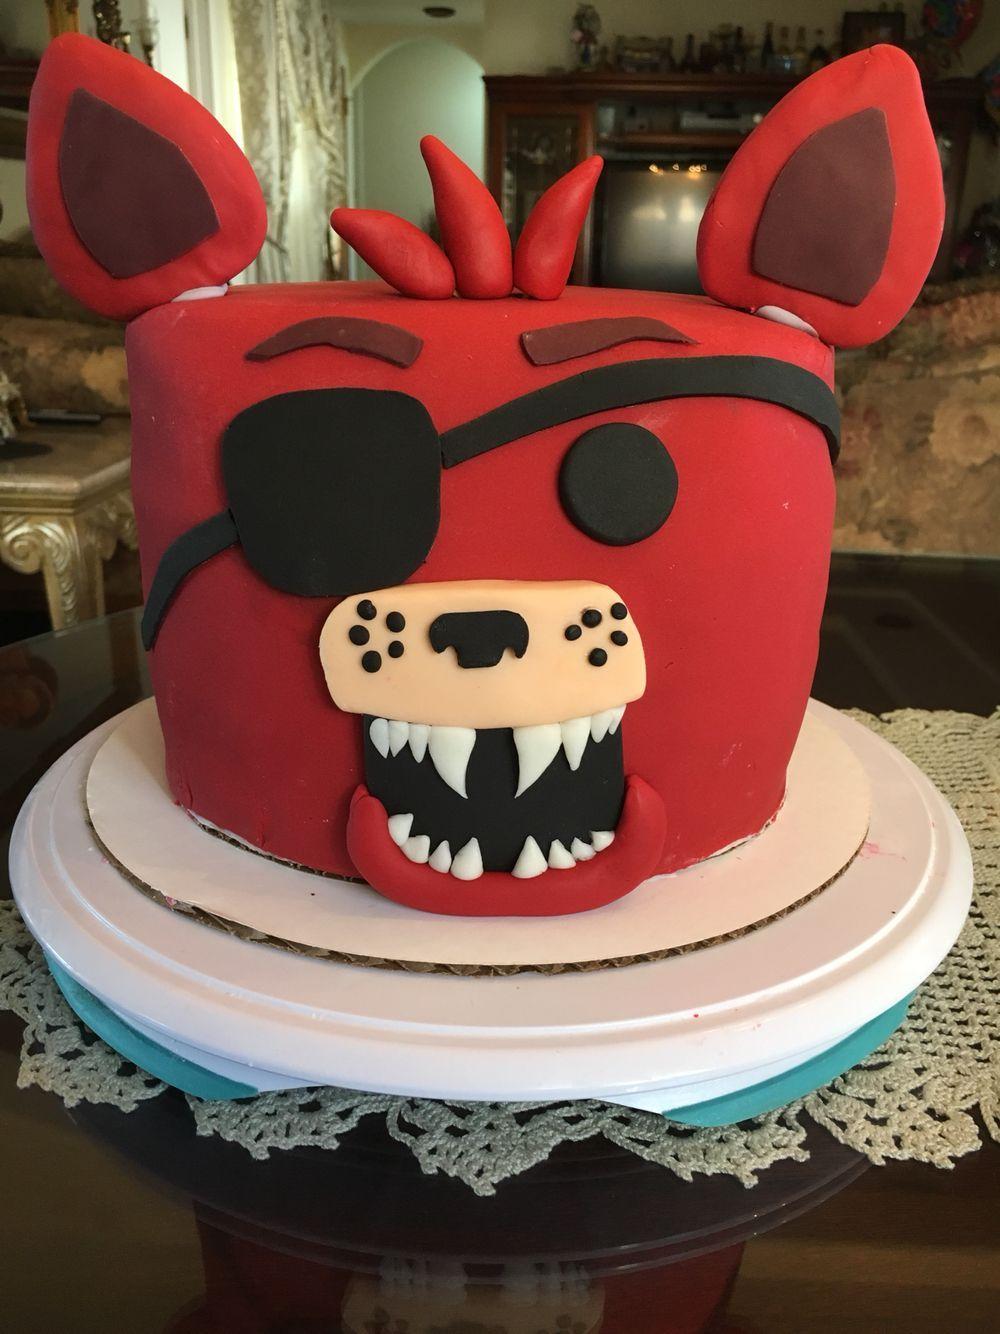 Five nights at freddys cake decorations torta para